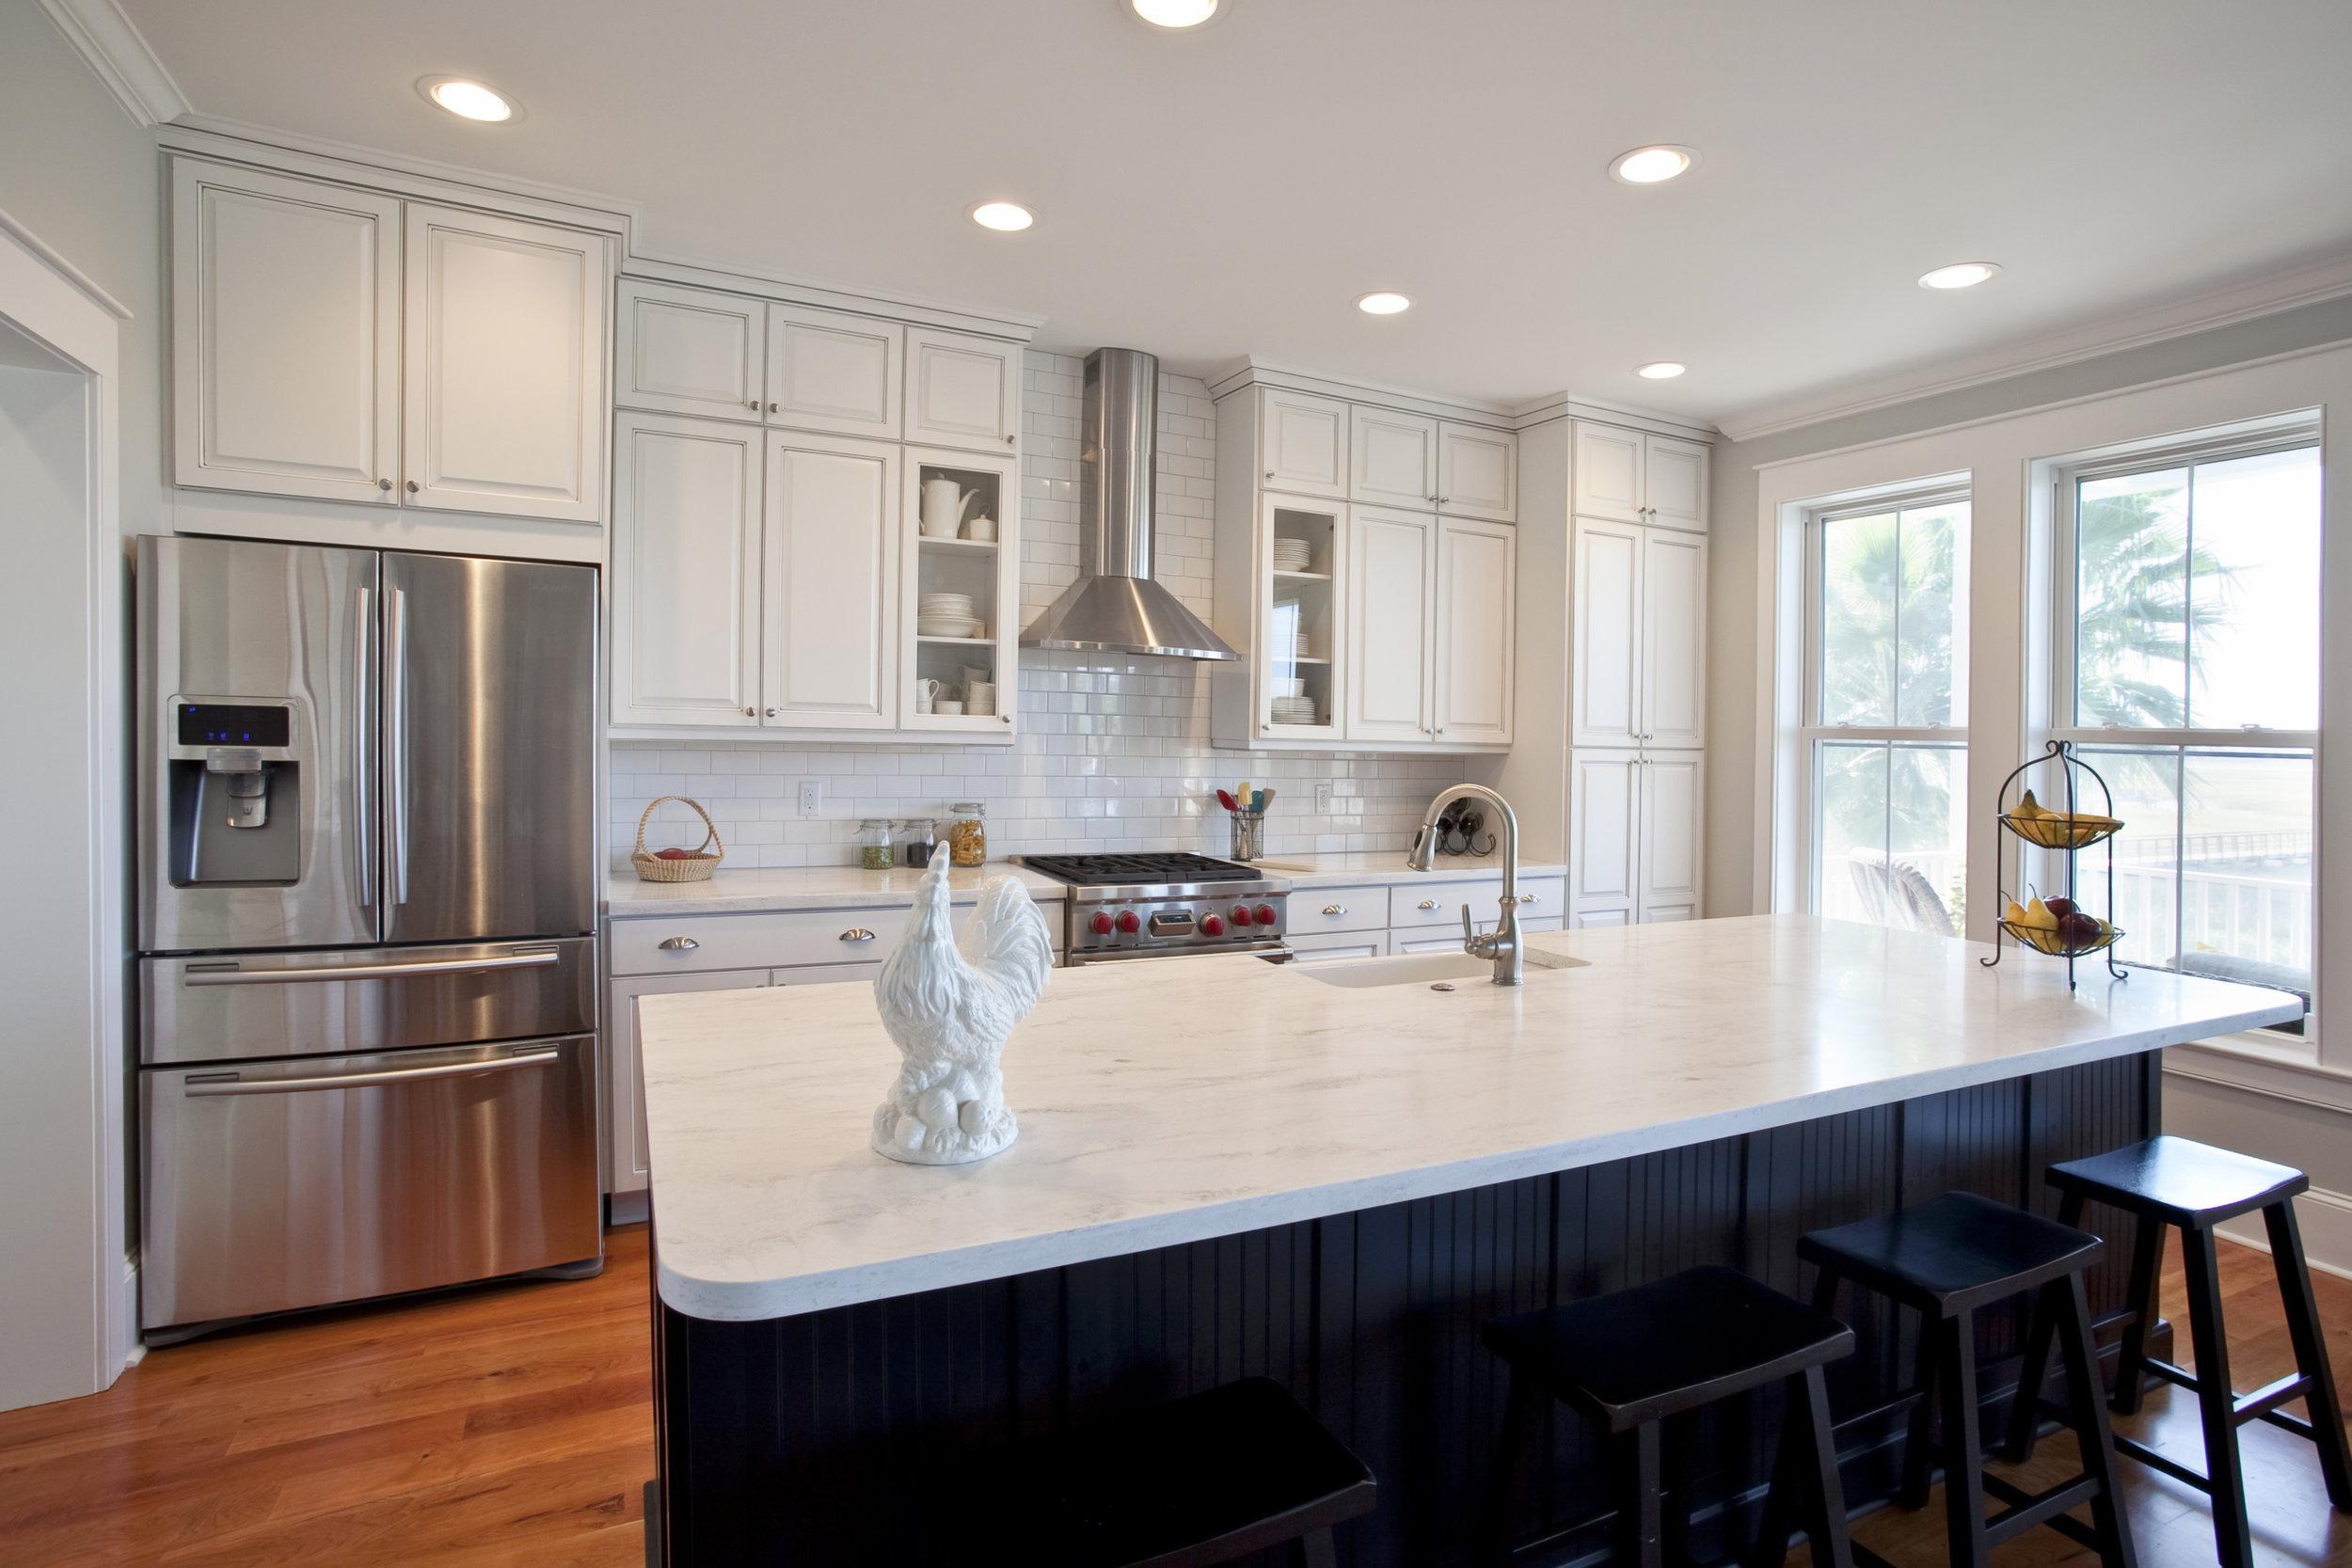 Charleston Home & Design - Summer 2013